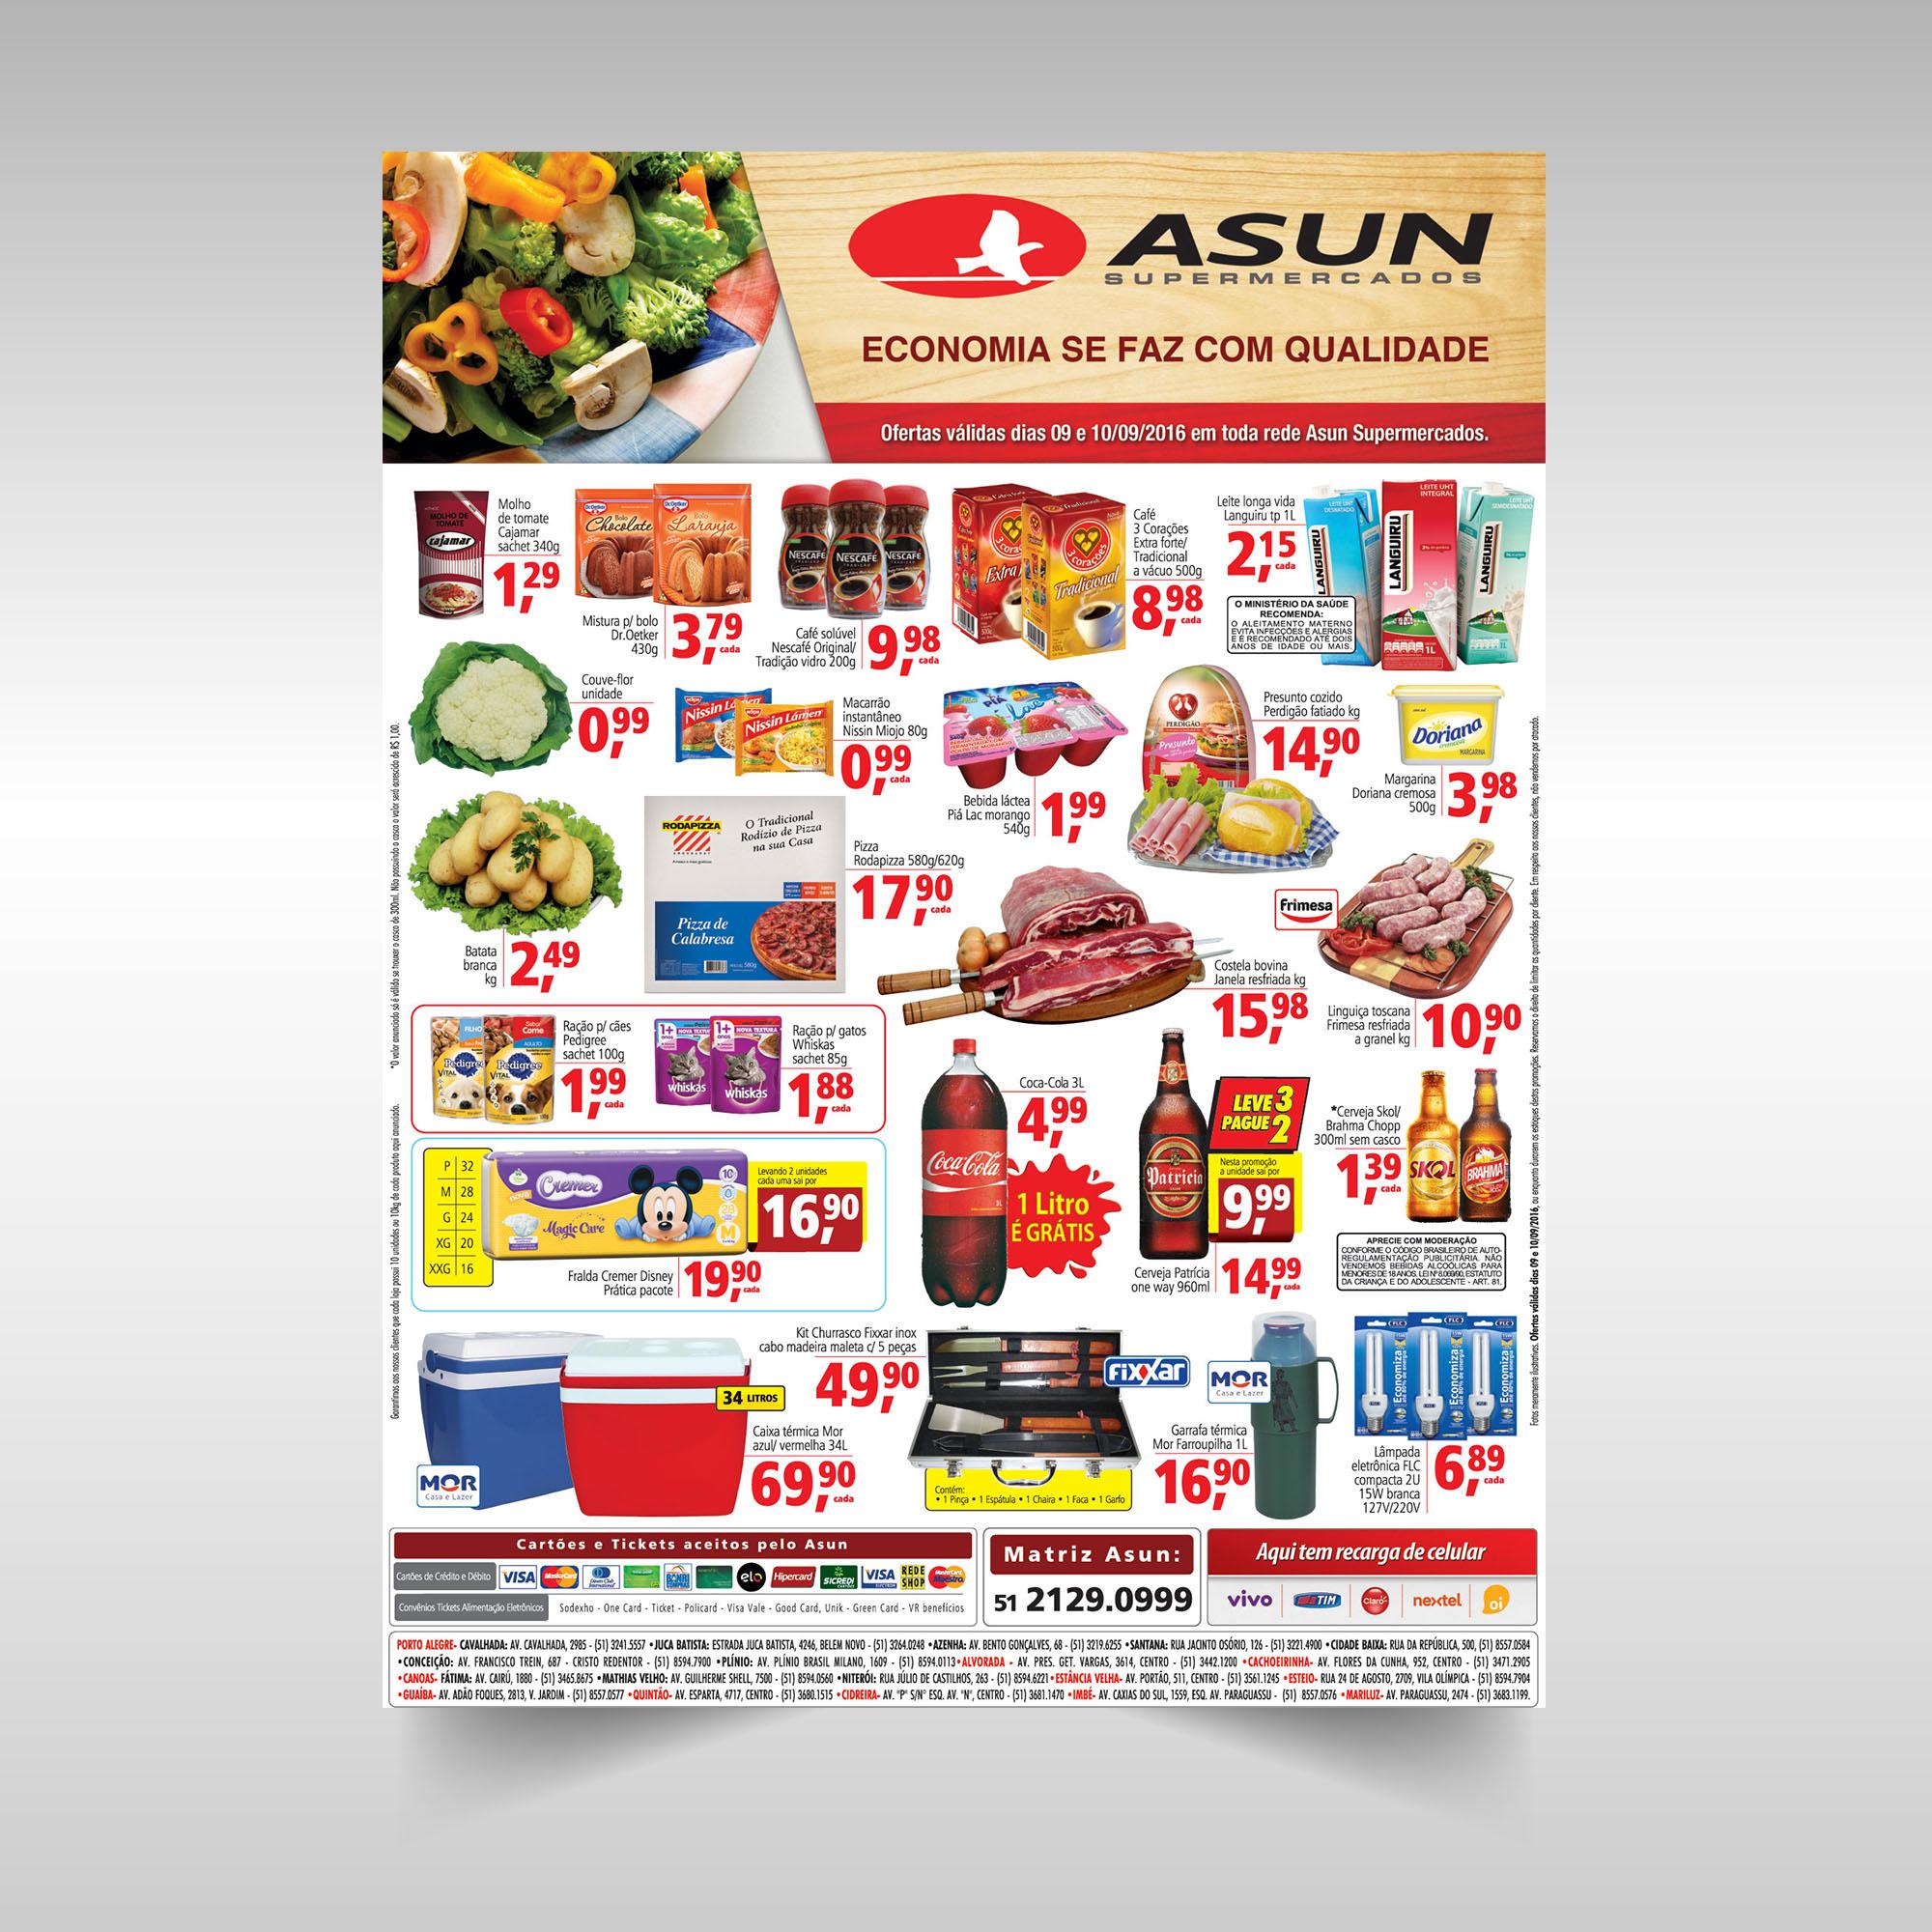 Anúncio Asun ofertas do mês